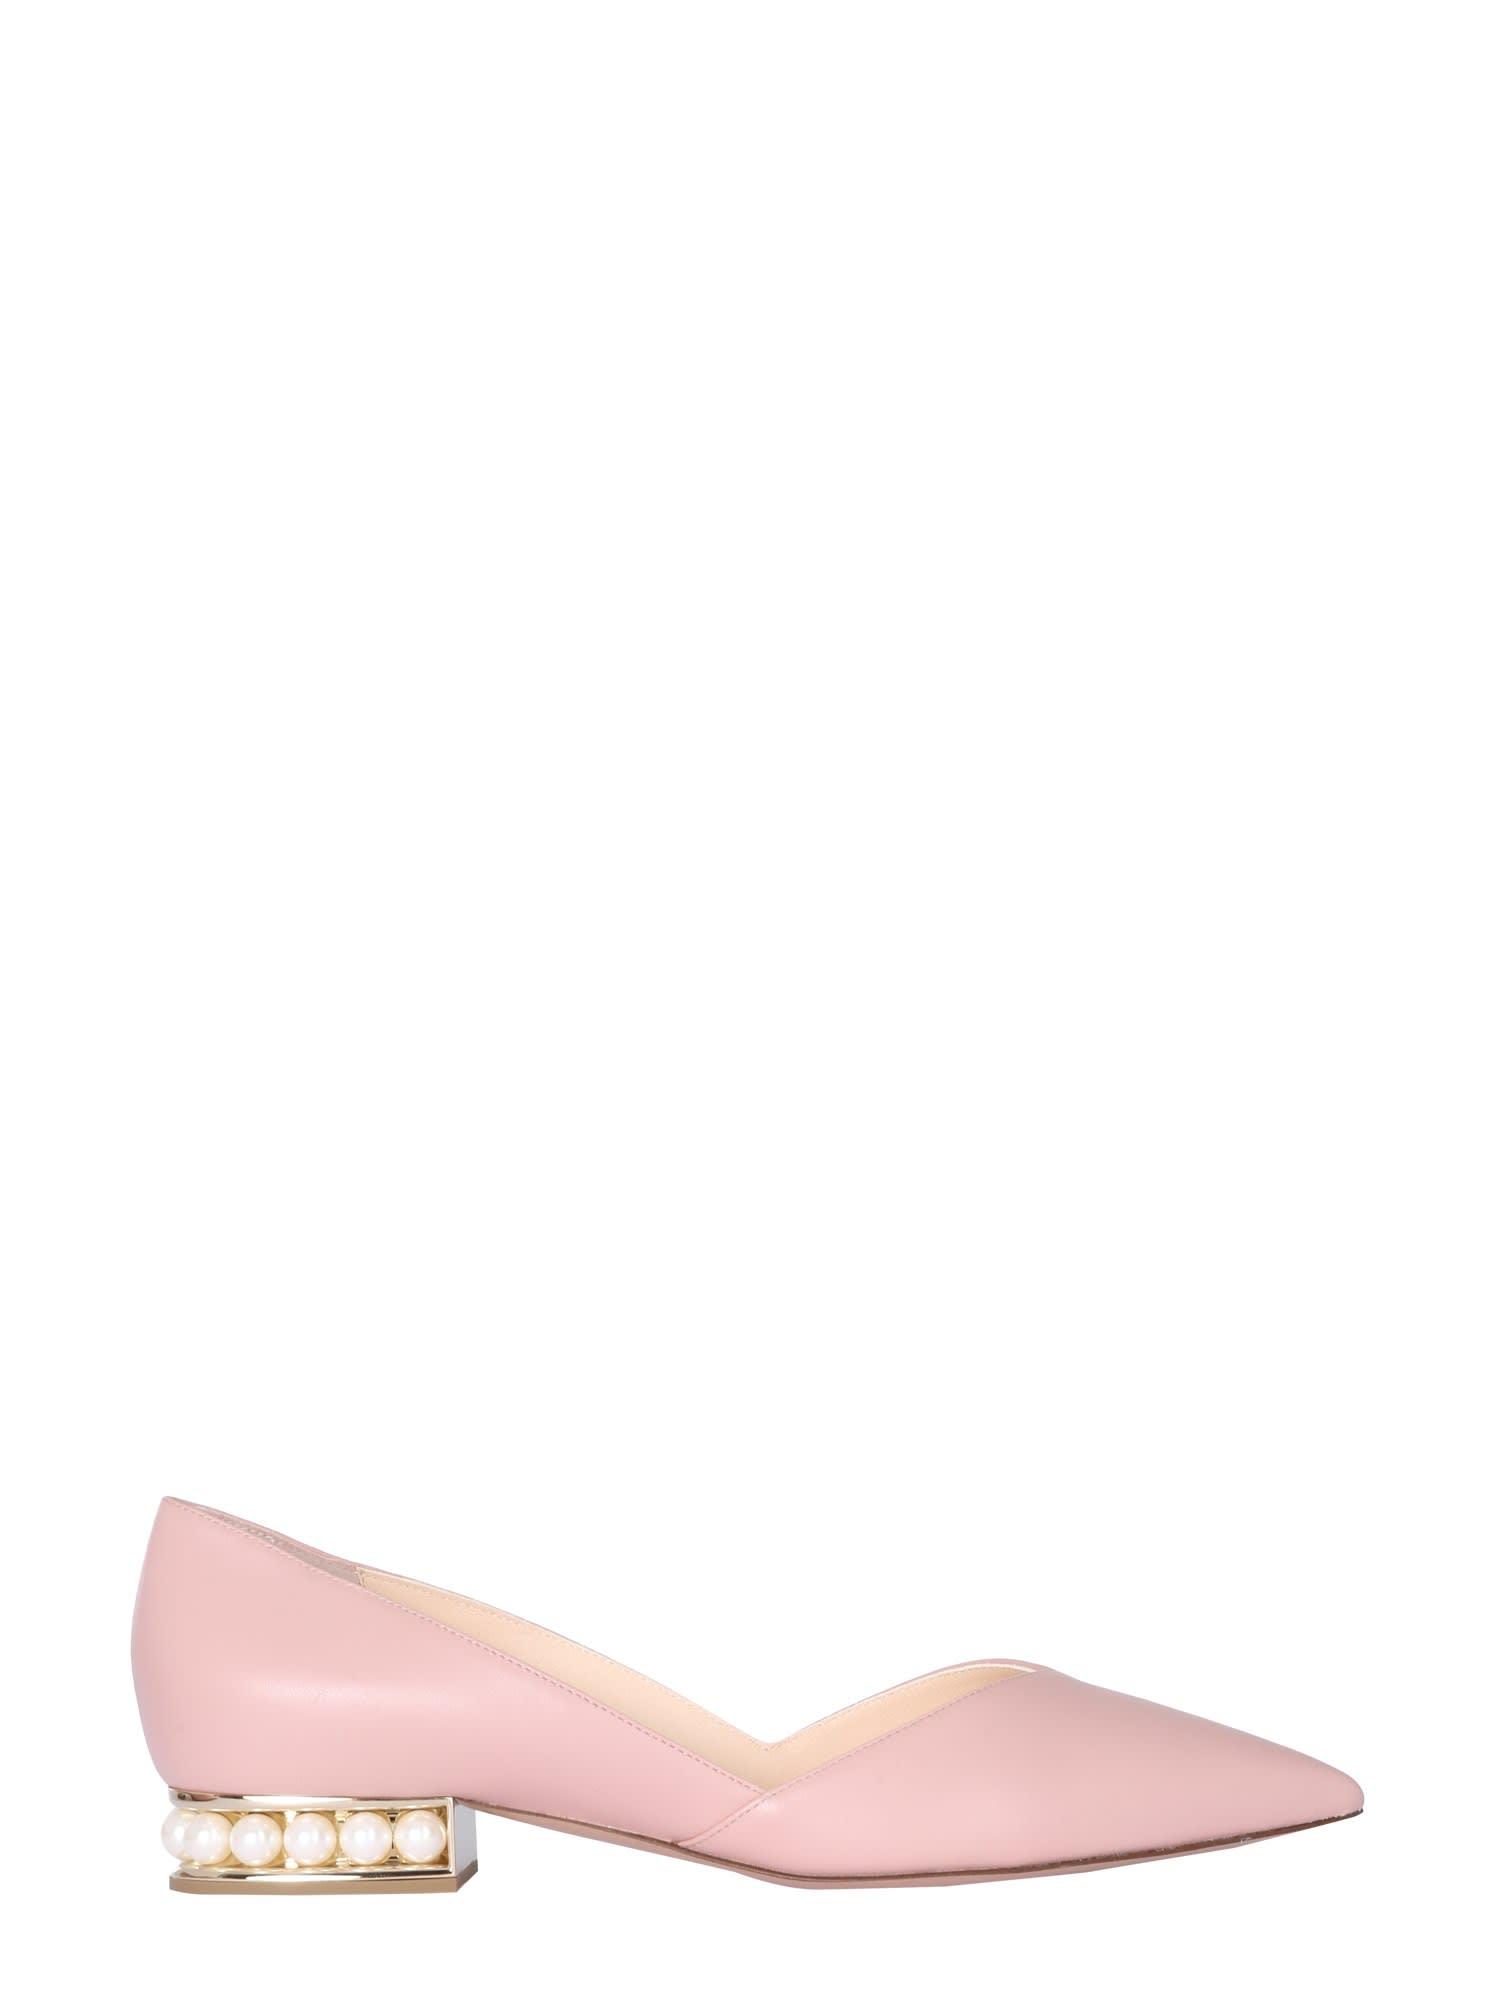 Buy Nicholas Kirkwood Casati Dorsay Ballerinas online, shop Nicholas Kirkwood shoes with free shipping